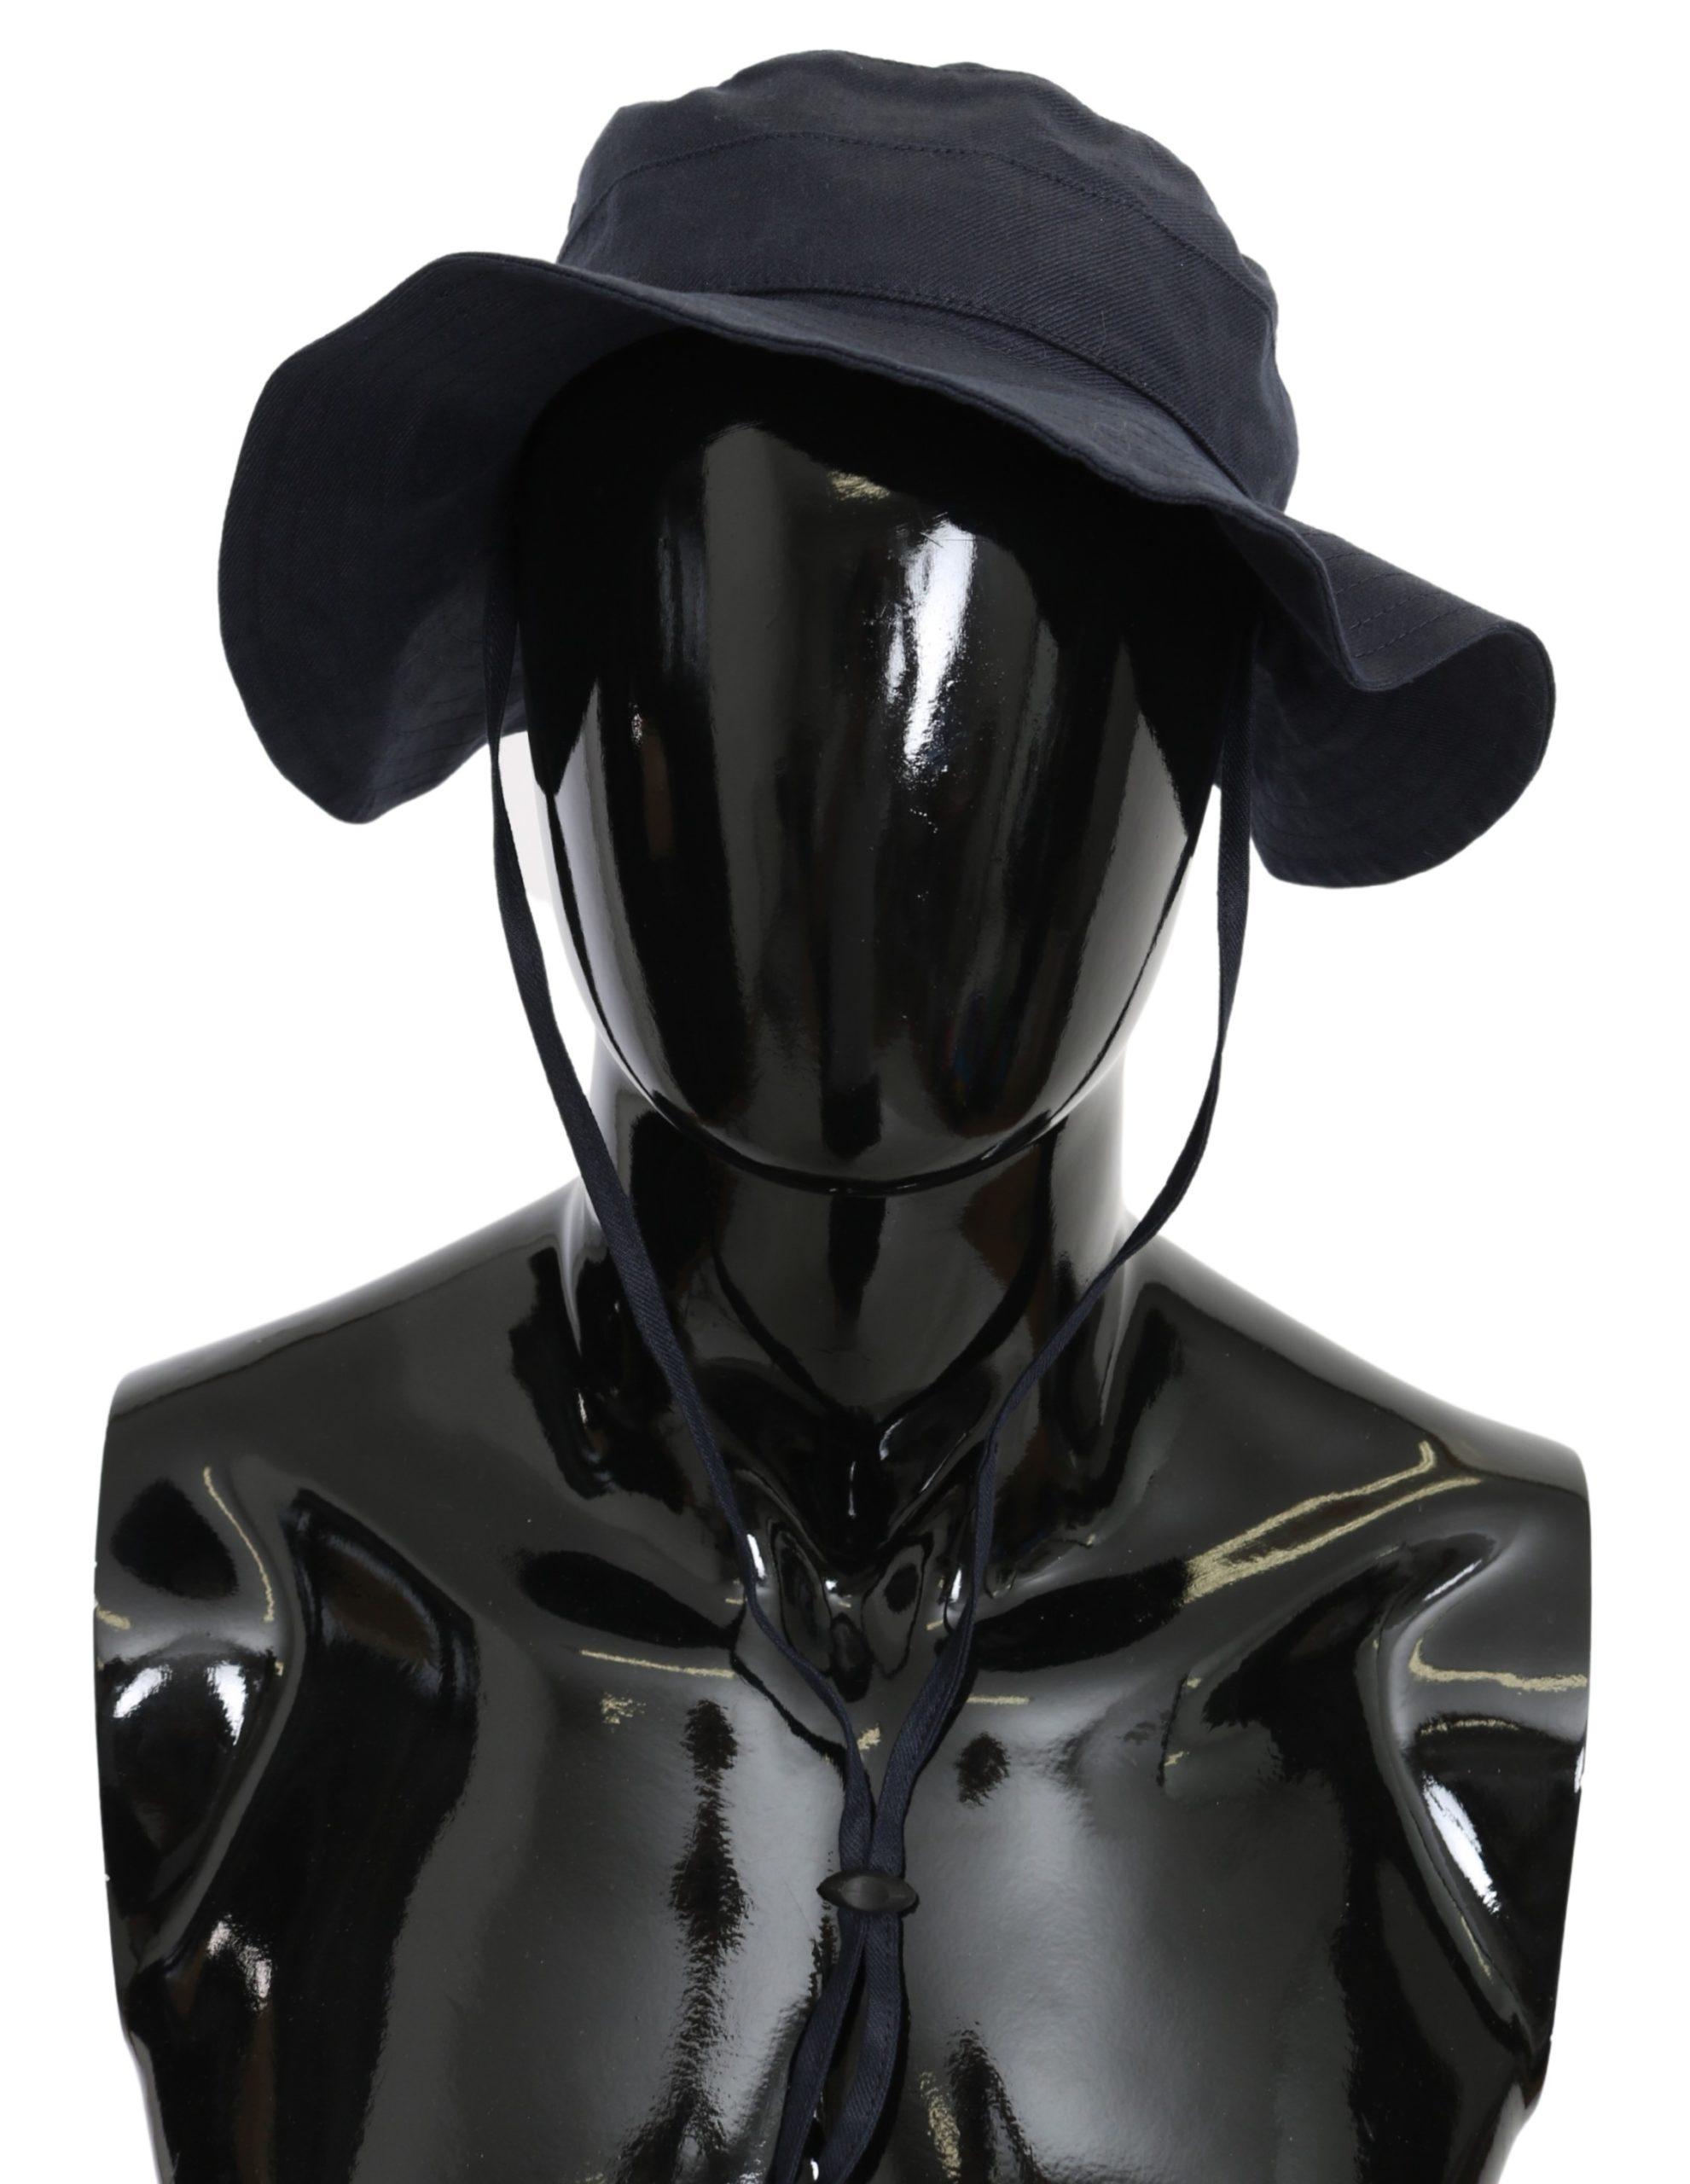 Dolce & Gabbana Men's Denim Cotton Solid Hat Blue HAT9093 - 58 cm|M